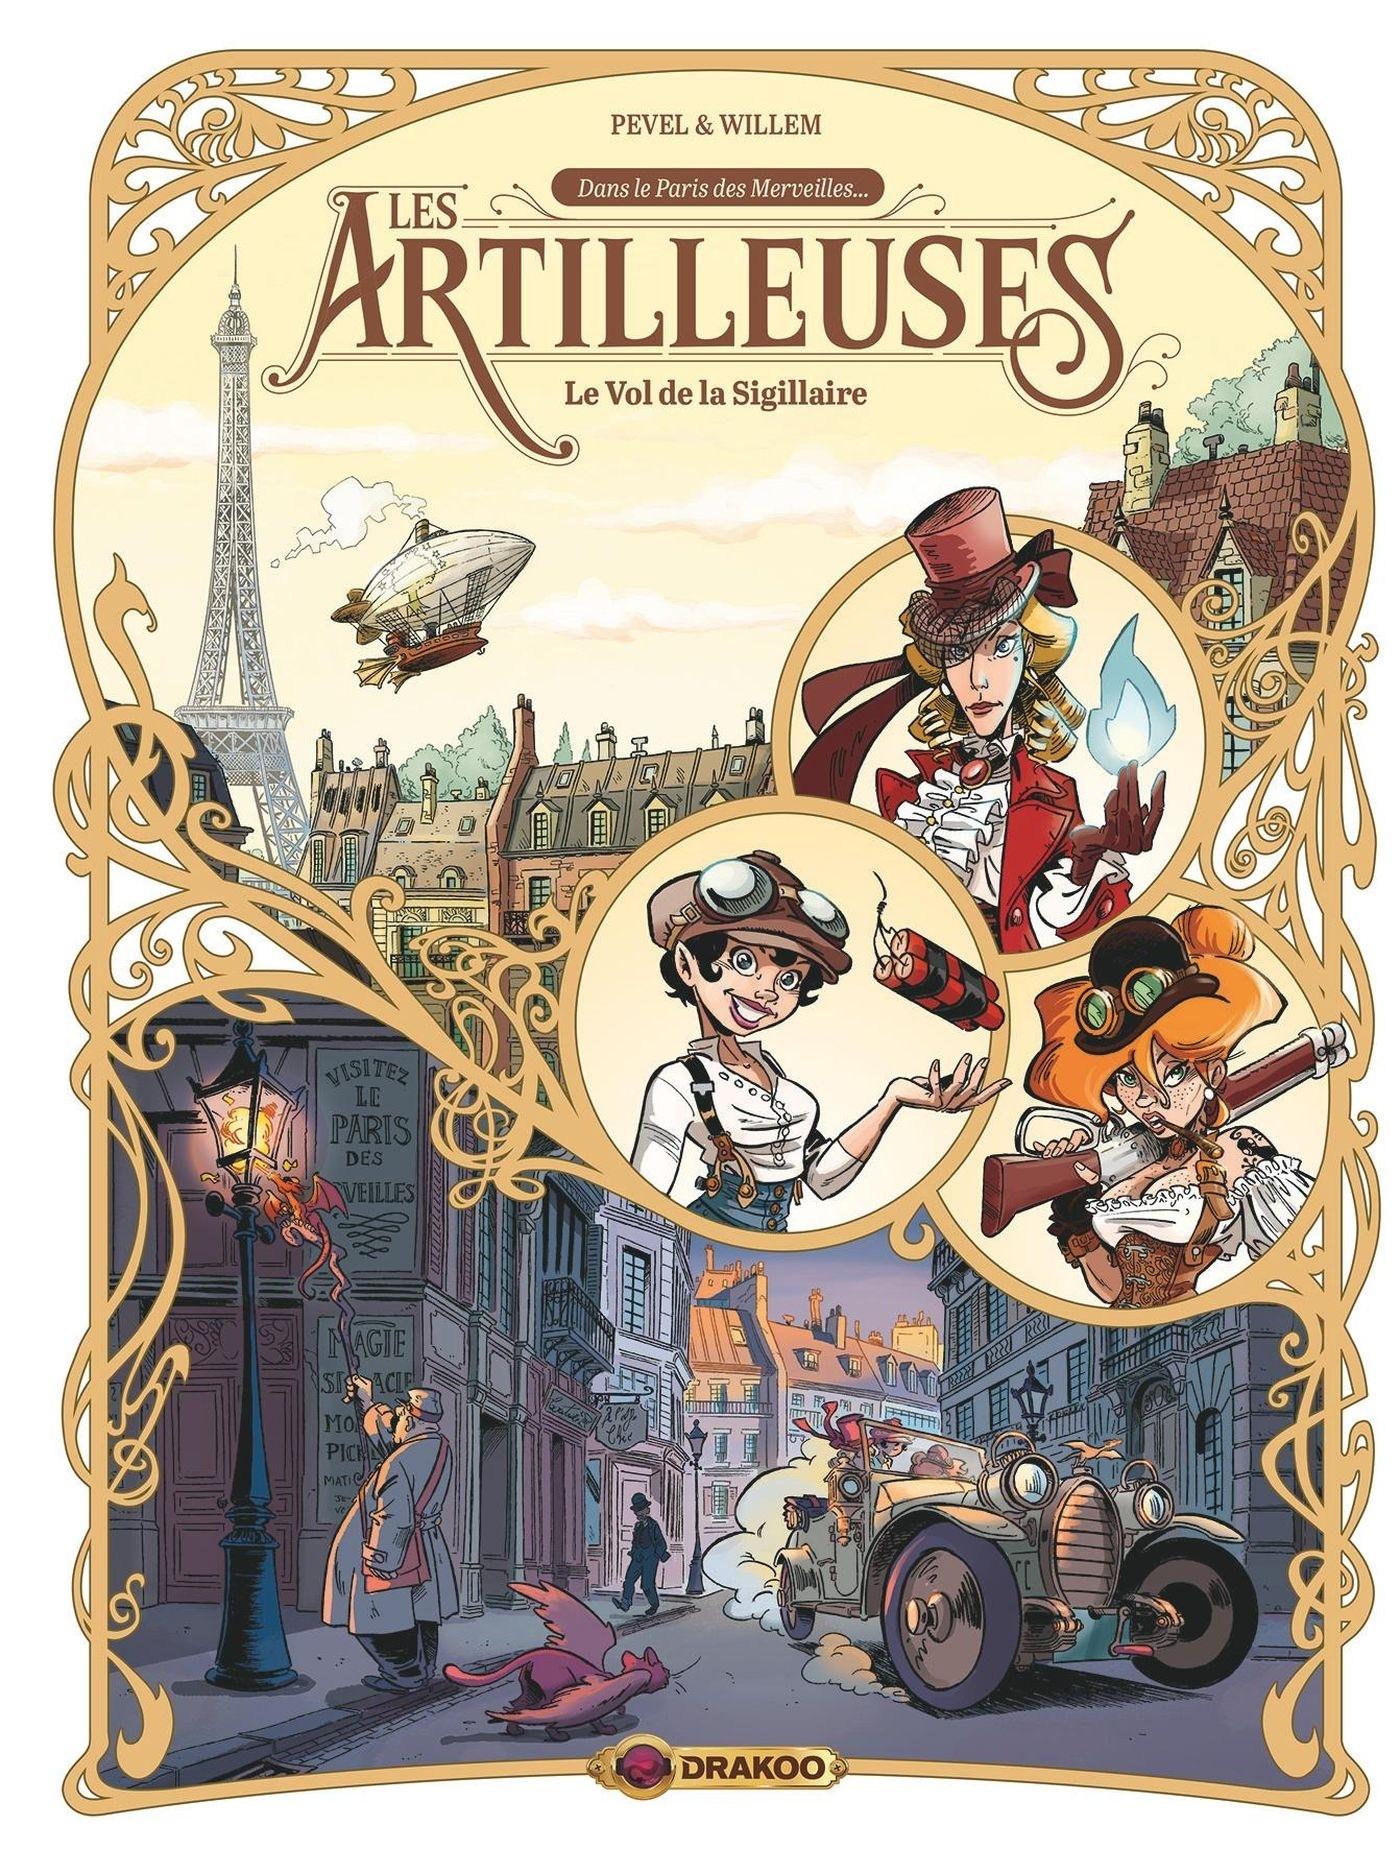 LES ARTILLEUSES - T01 - LES ARTILLEUSES - VOL. 01/3 - LE VOL DE LA SIGILLAIRE